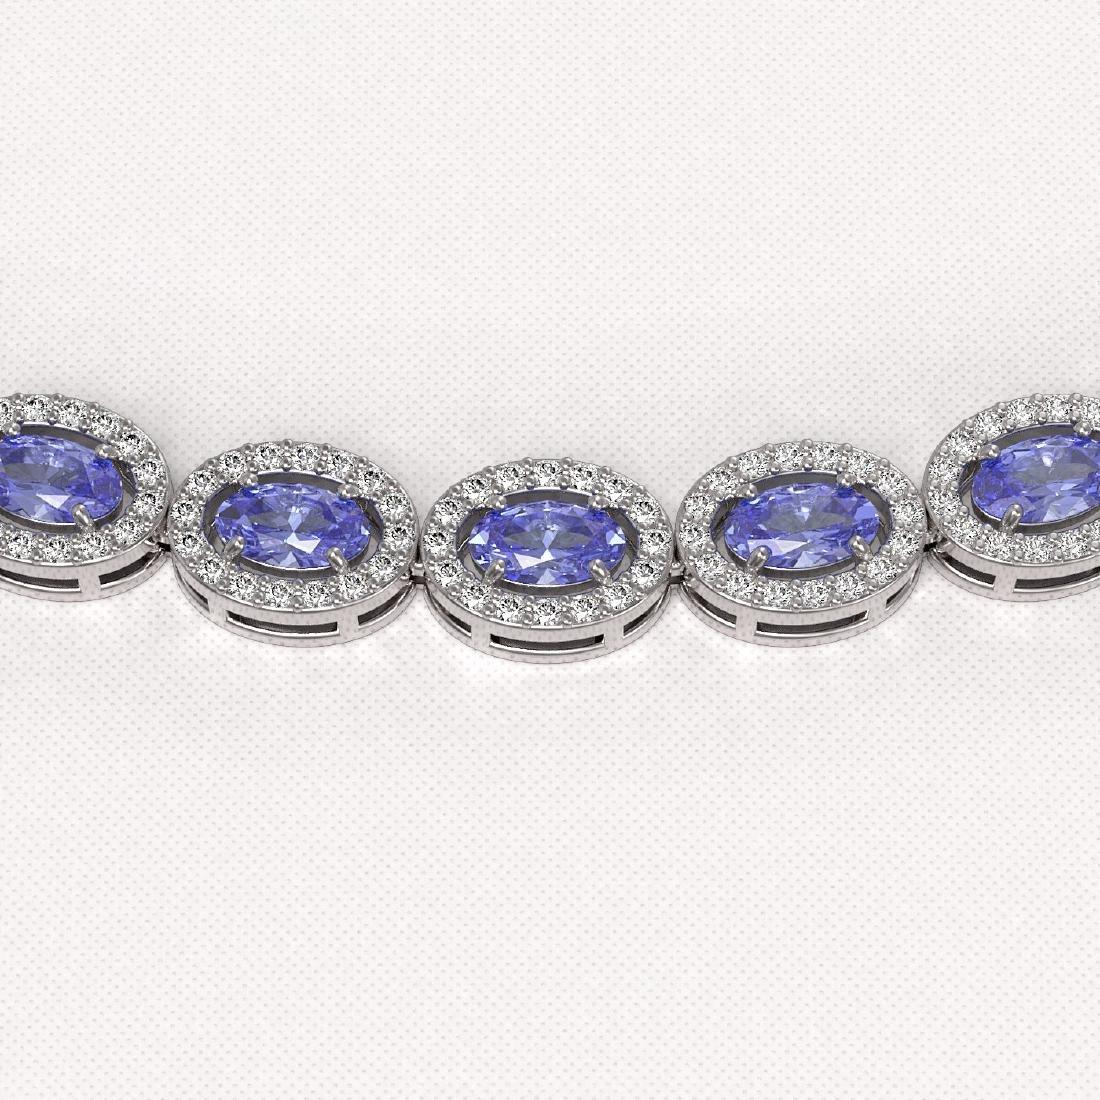 22.62 CTW Tanzanite & Diamond Halo Necklace 10K White - 3